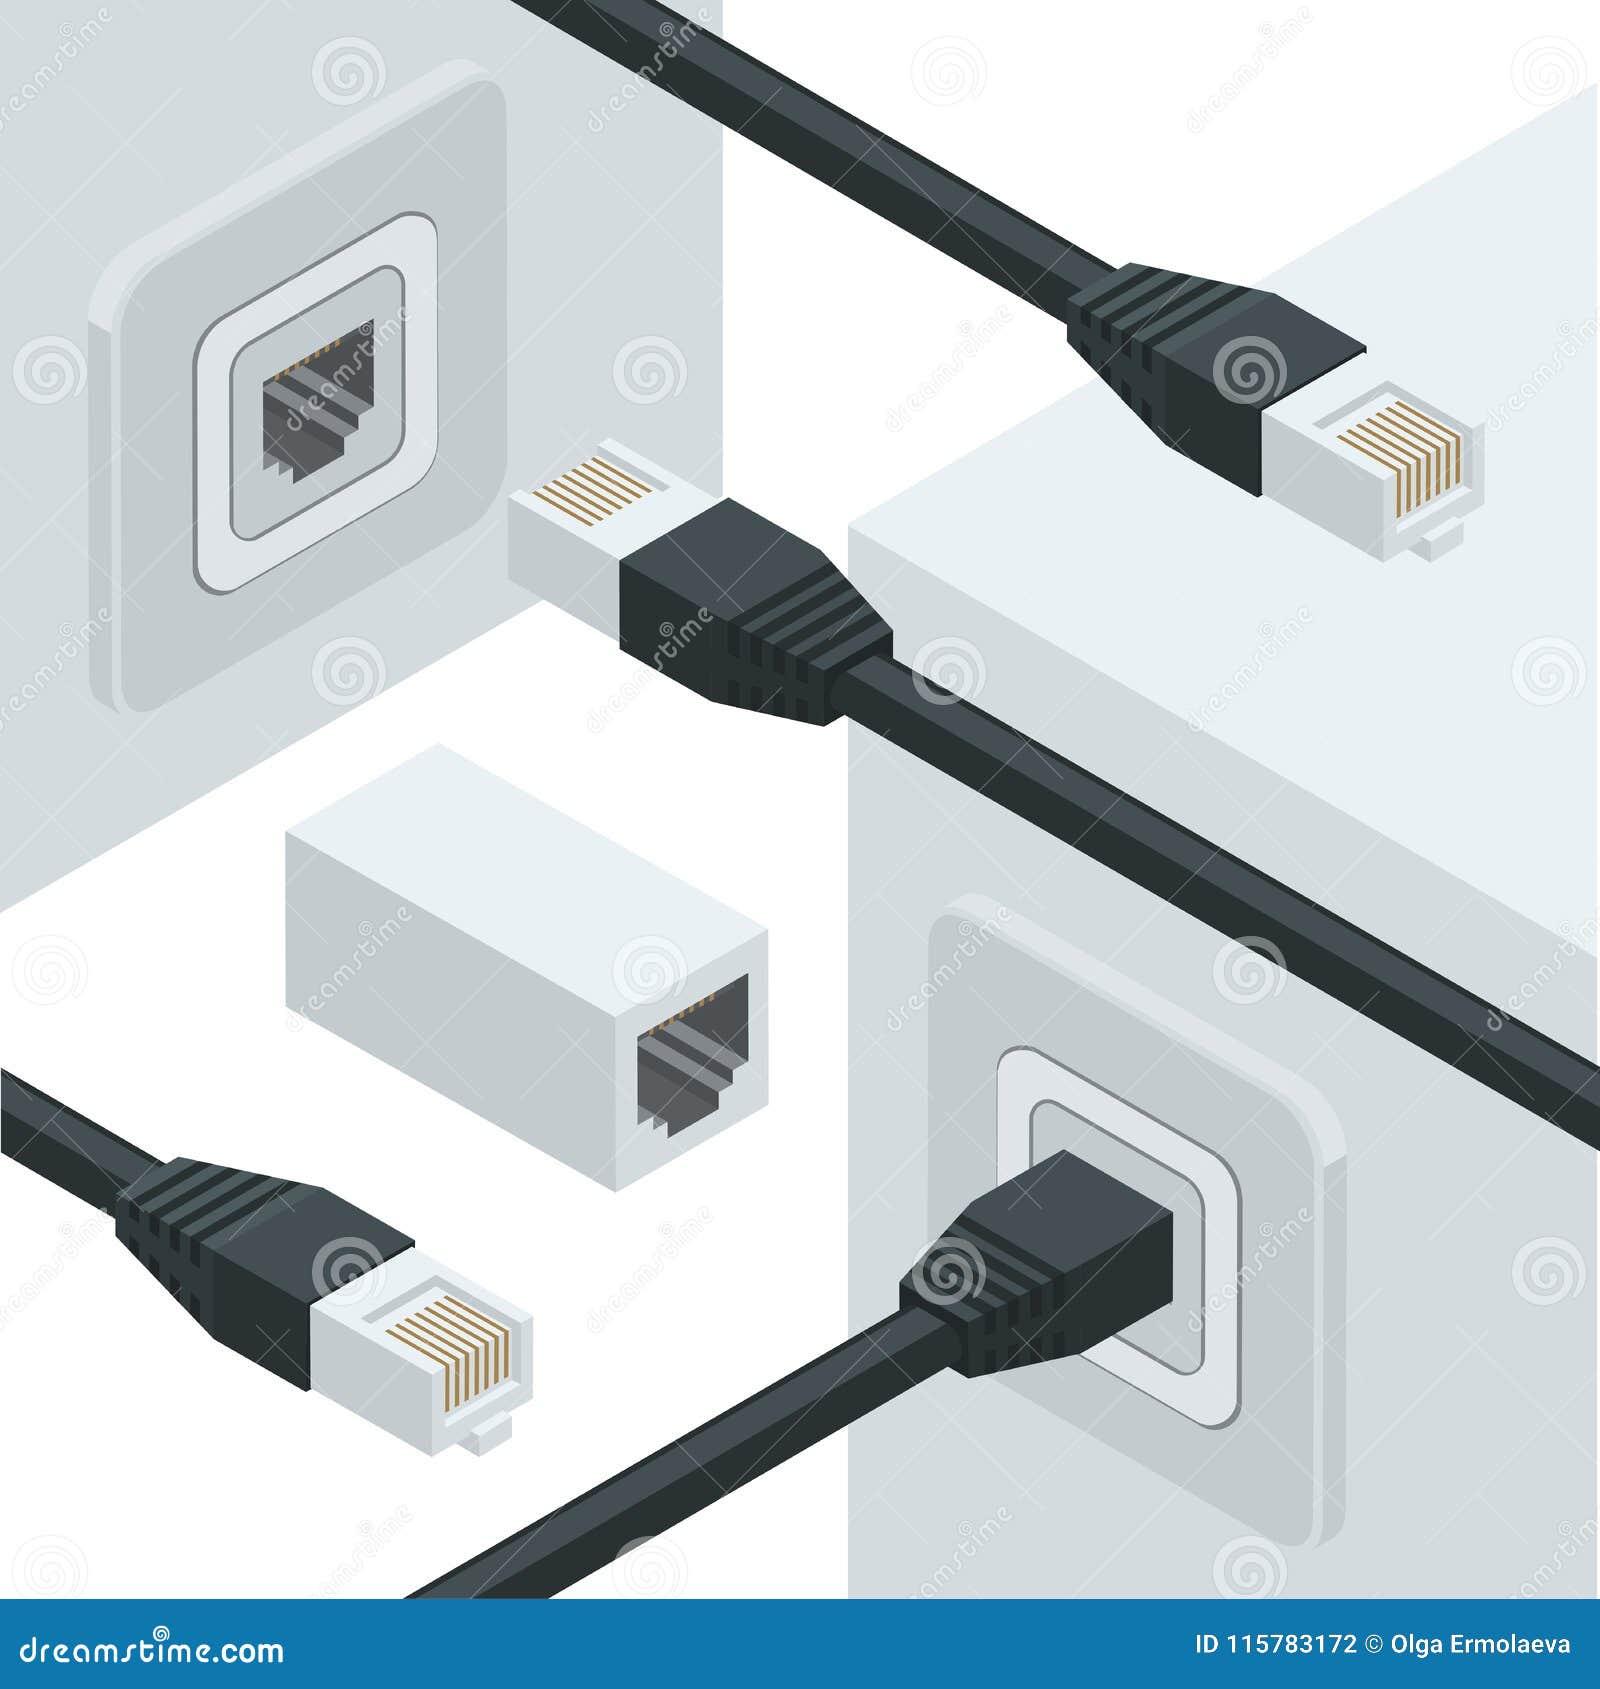 Network Internet Data Connectors Stock Vector - Illustration of ...